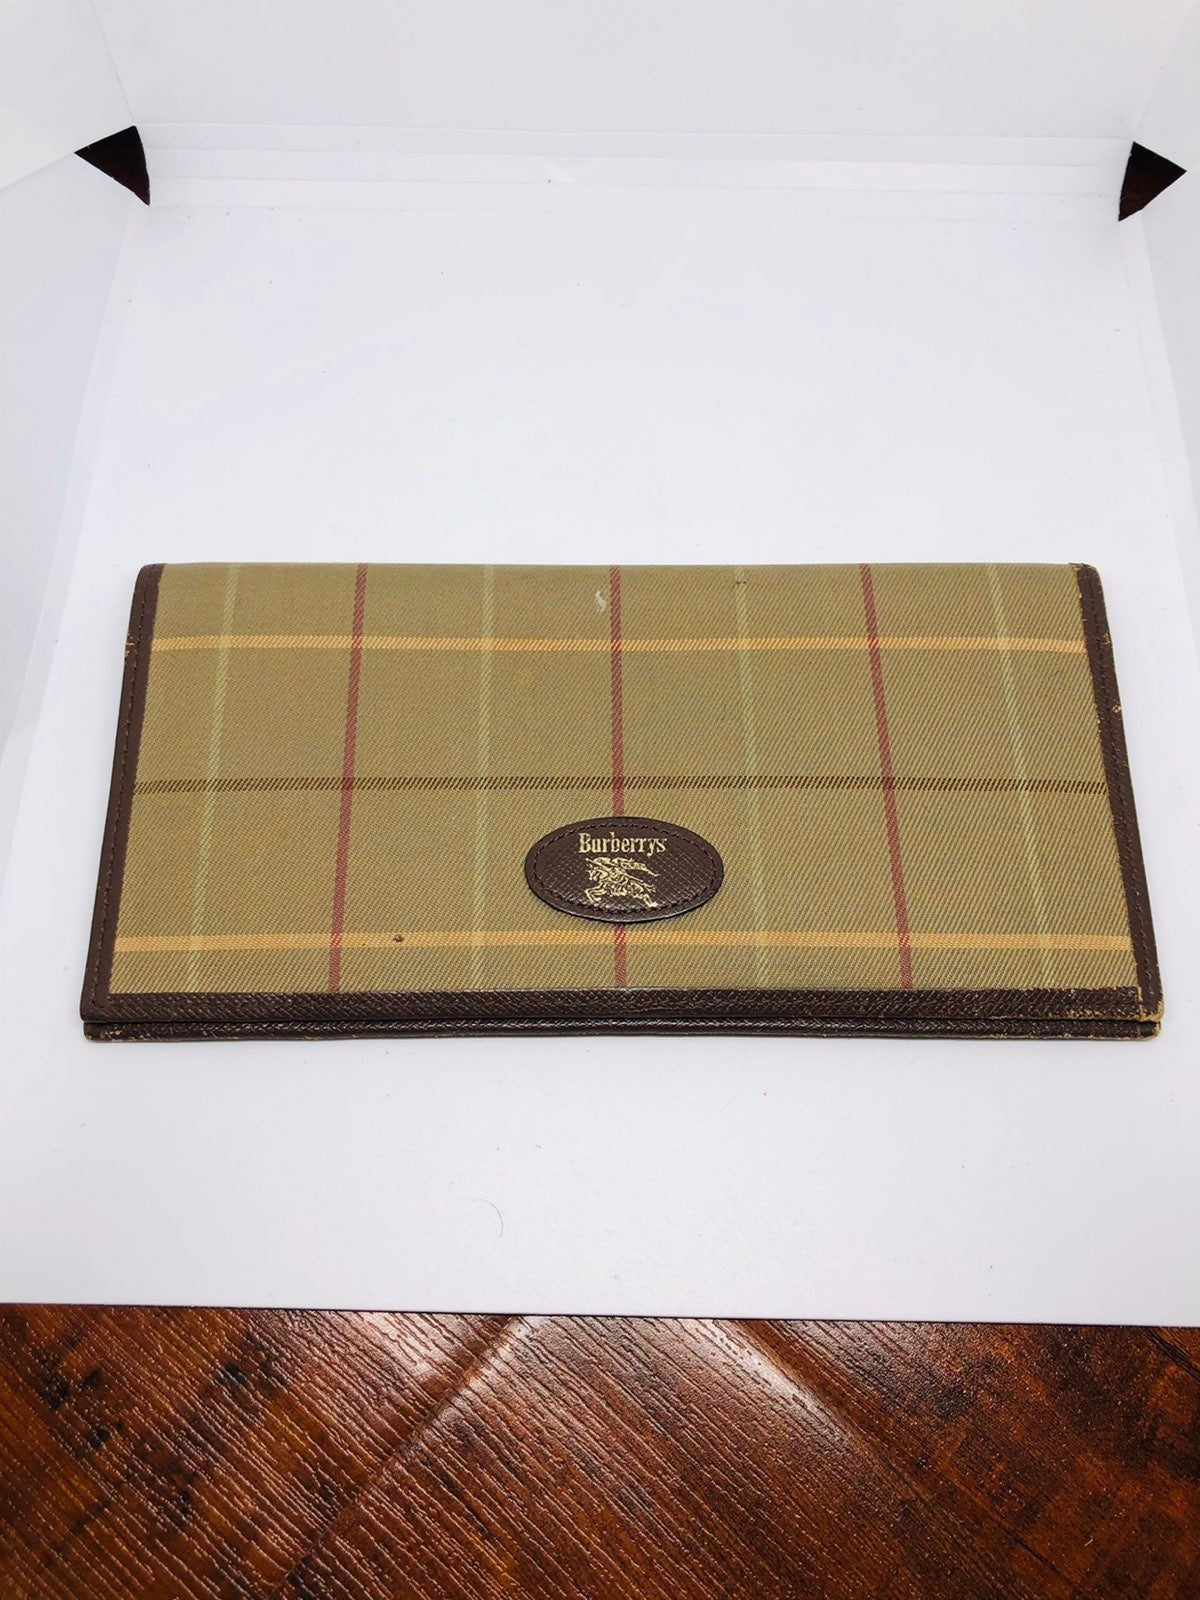 Burberry Long bi fold wallet